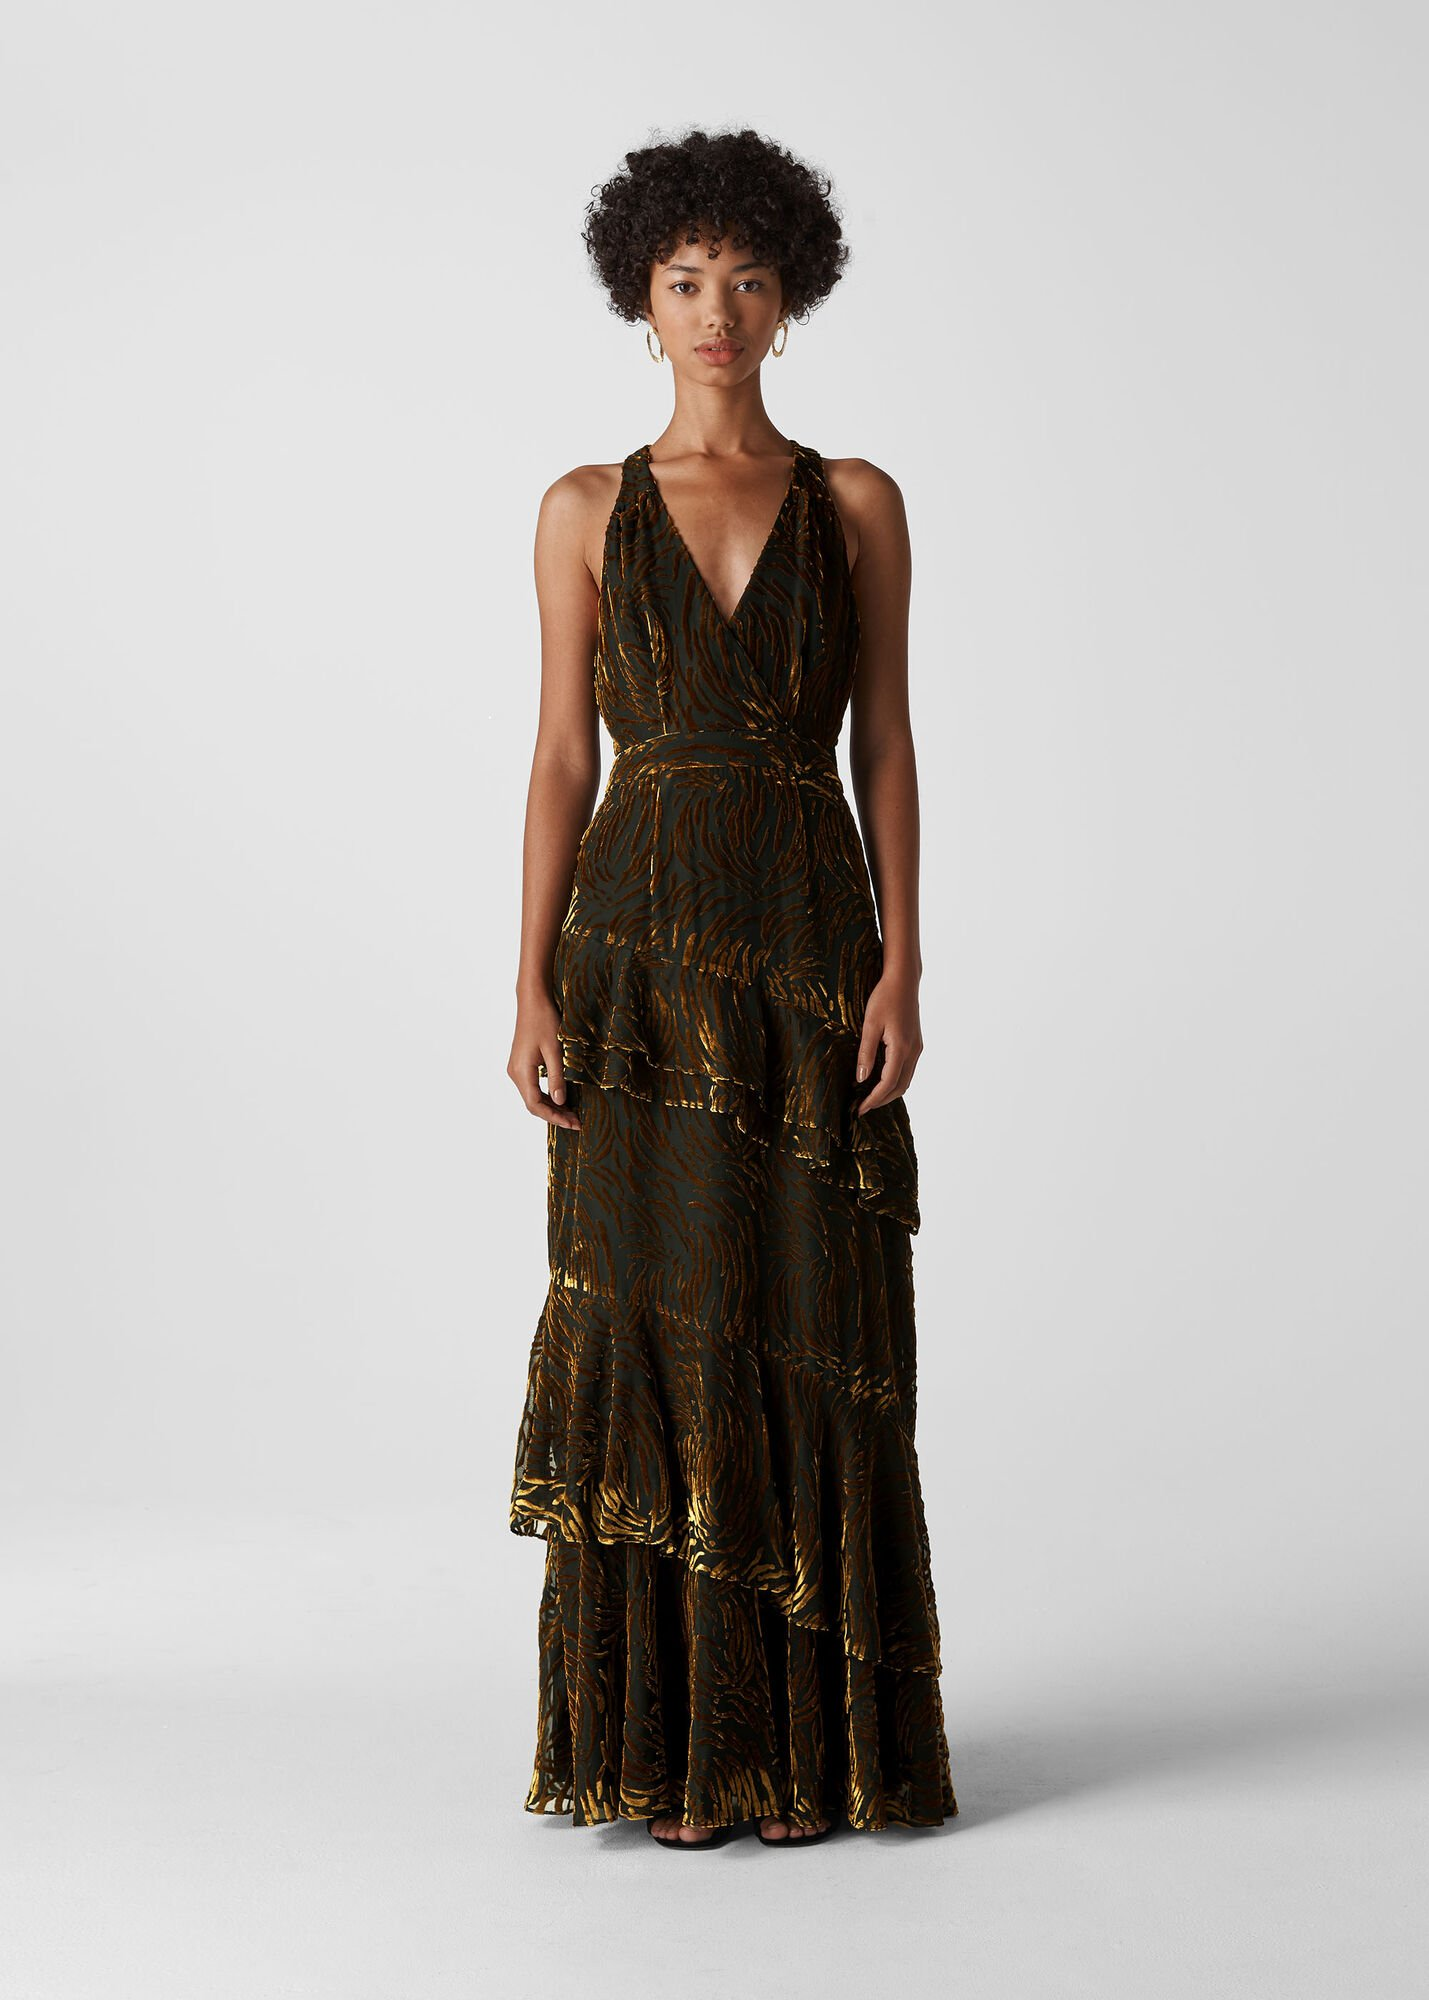 Edith Reed Print Maxi Dress